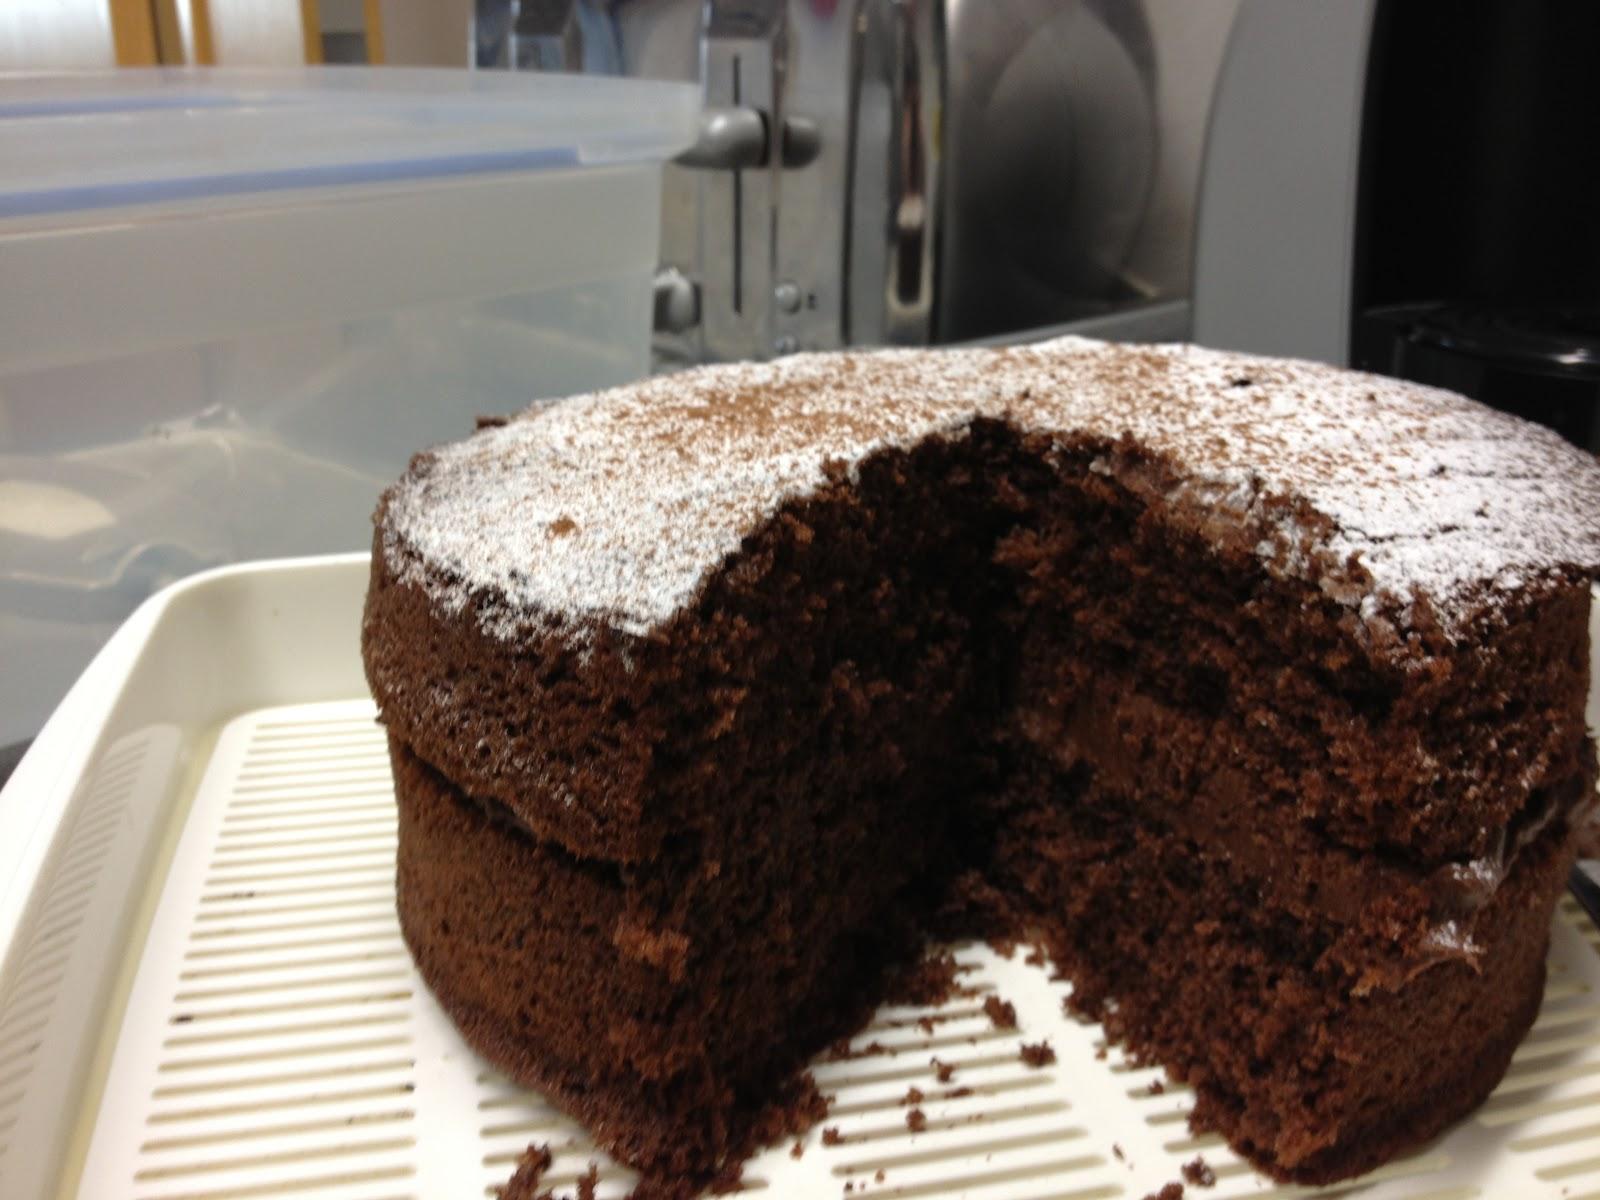 How To Make Victoria Sponge Into Chocolate Cake